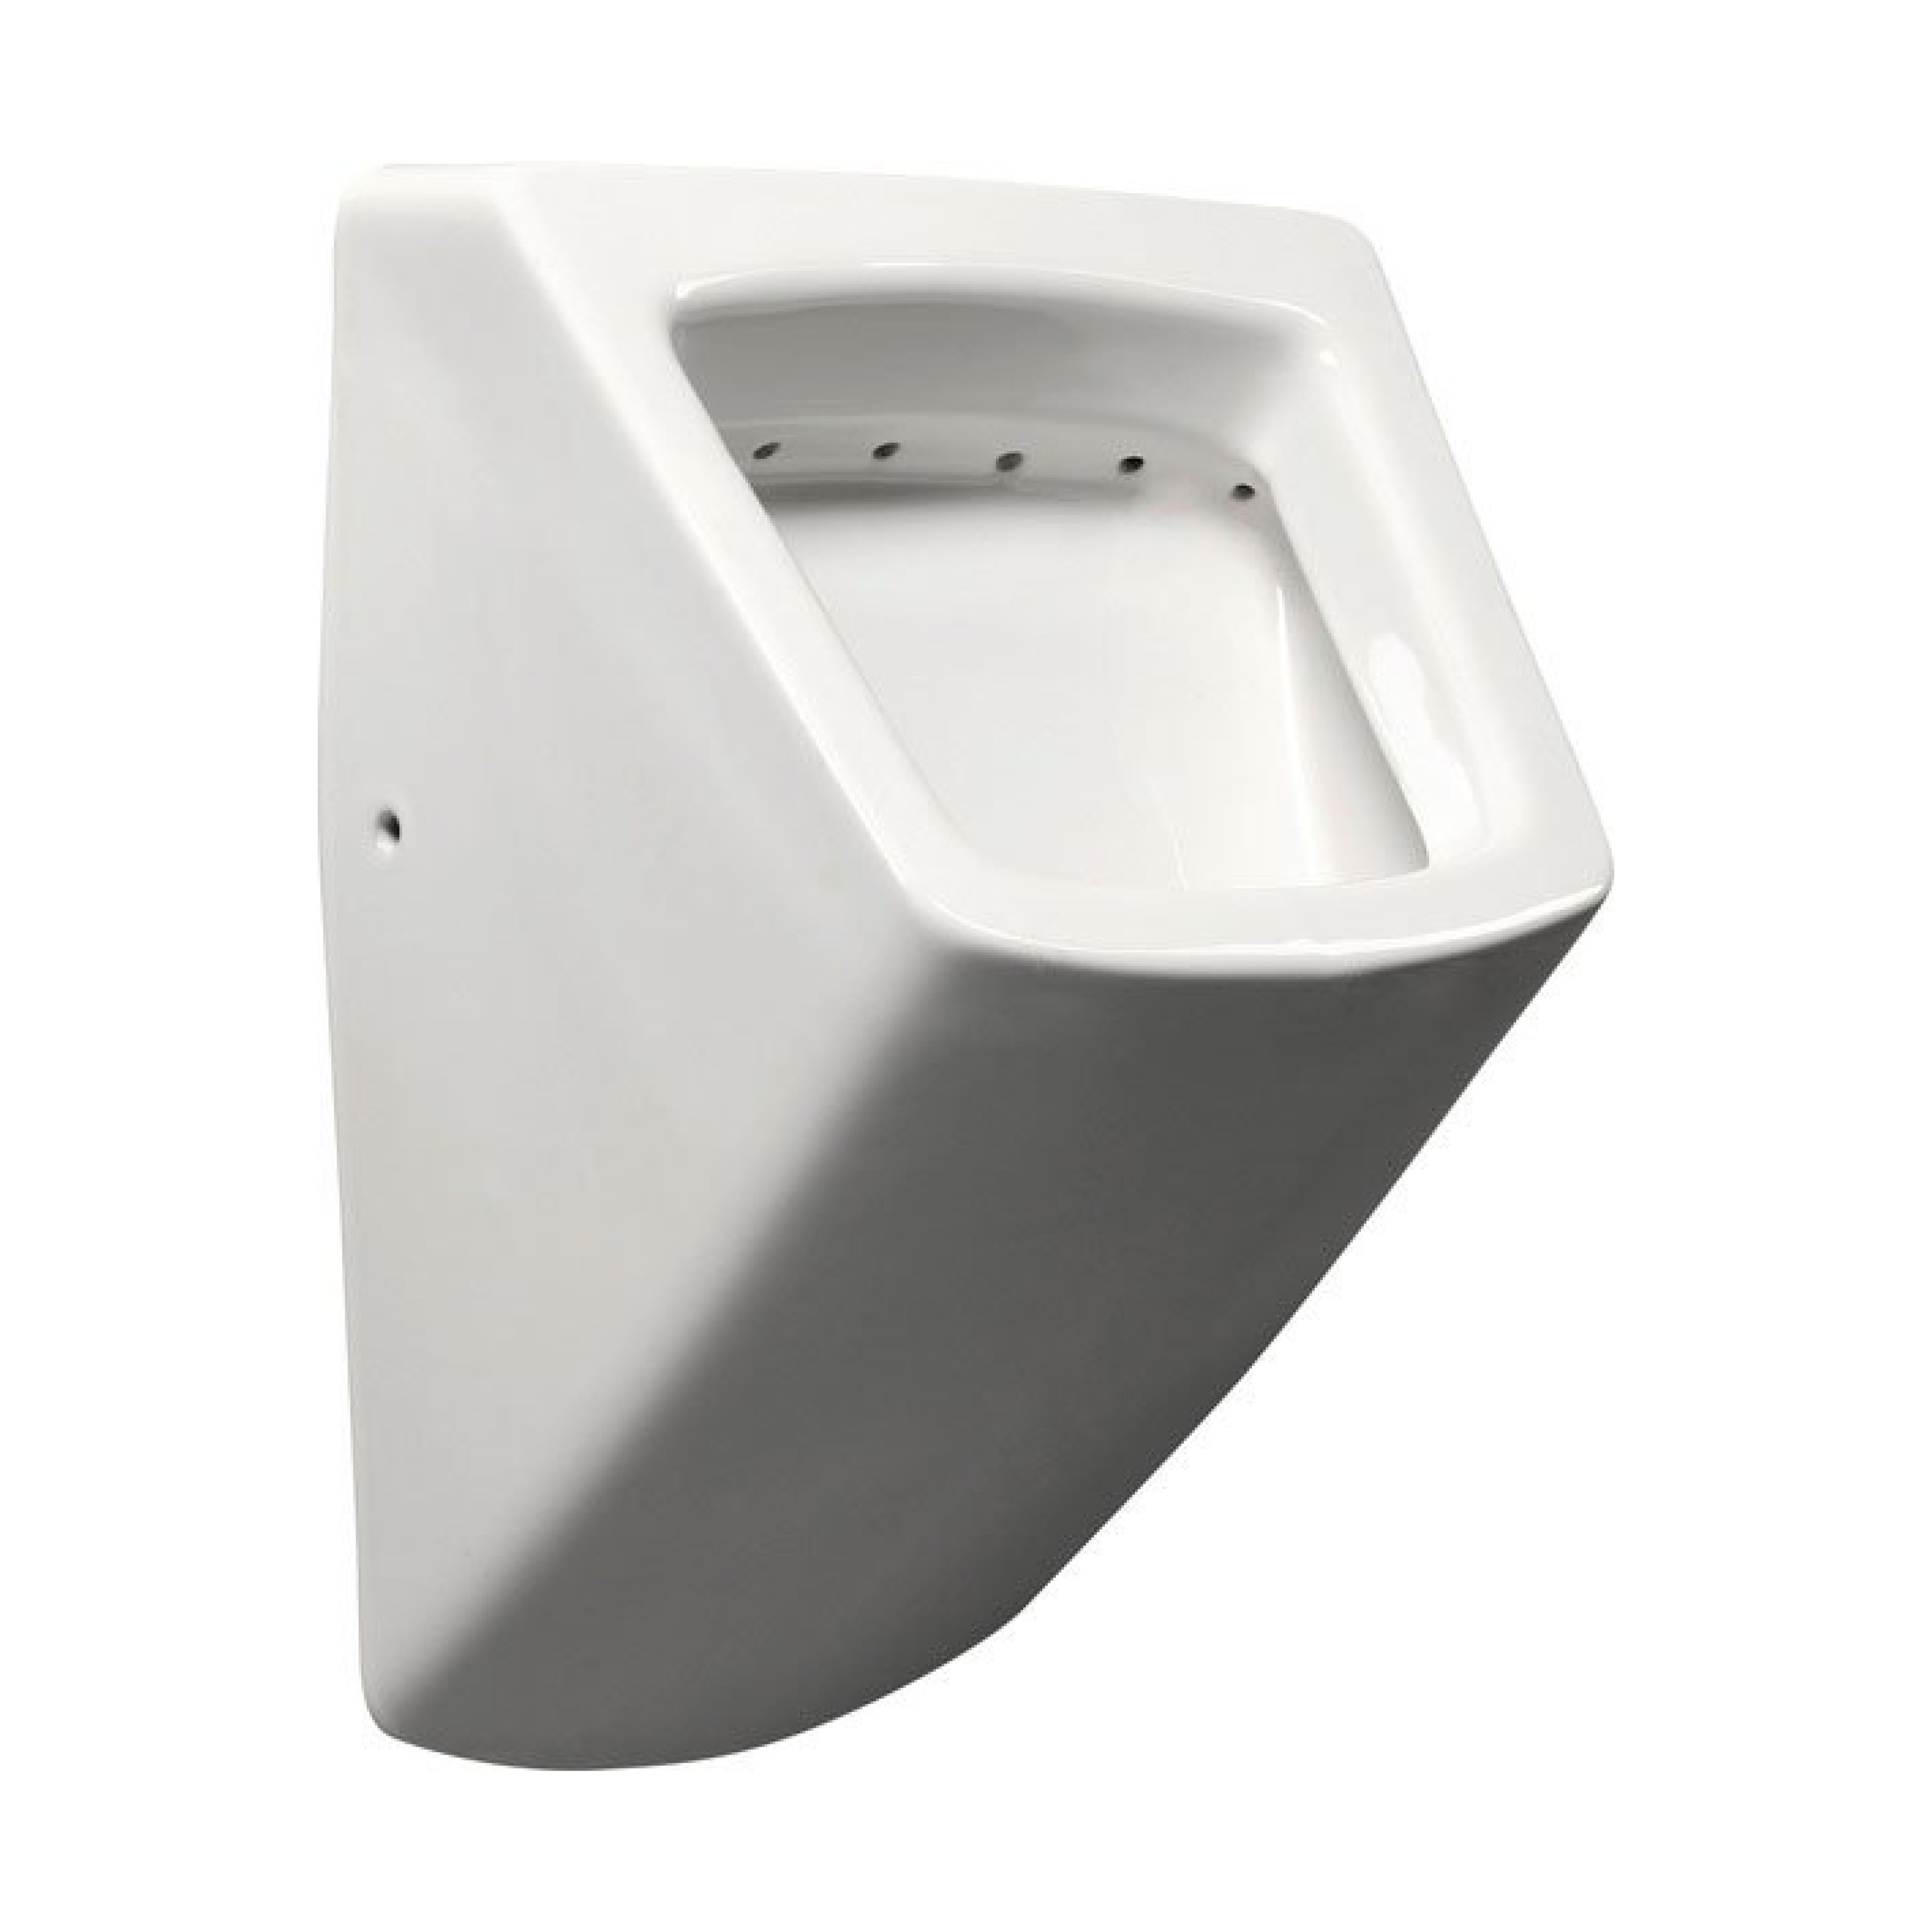 Salle De Bain Urinoir ~ urinoir 38x53cm purity 10pl92001 aquabains